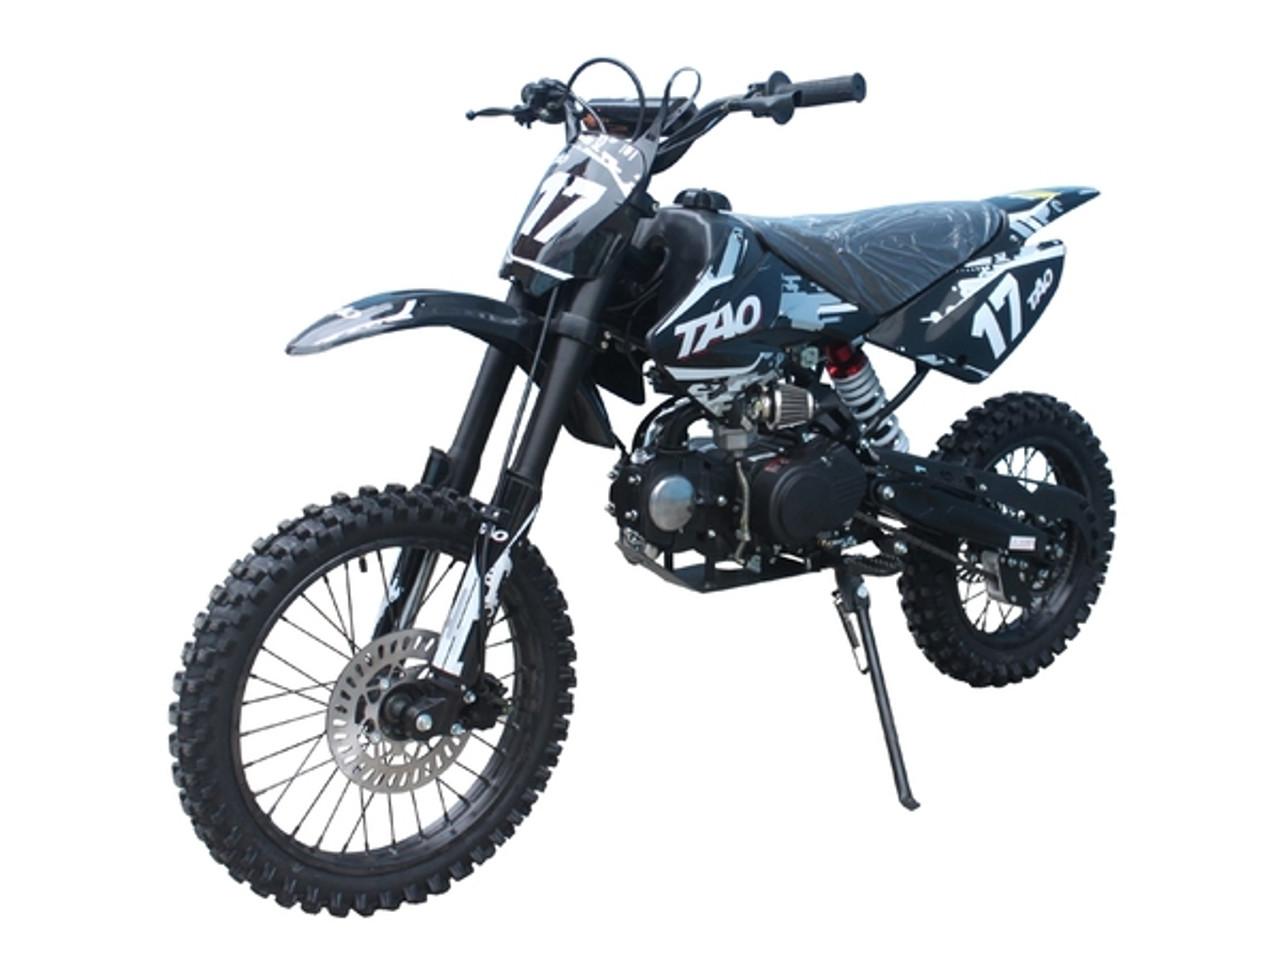 "Taotao High End Dirt Bike 17 125CC Big With 17"" Tires, Air Cooled, 4-Stroke, 1-Cylinder"